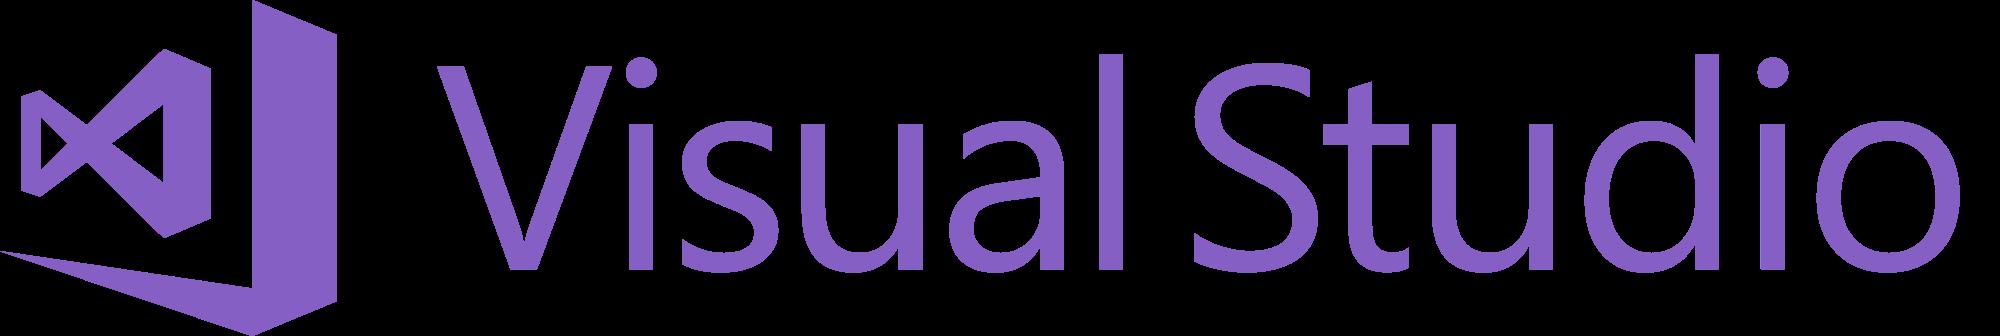 Visual_Studio_2017_logo_and_wordmark.svg